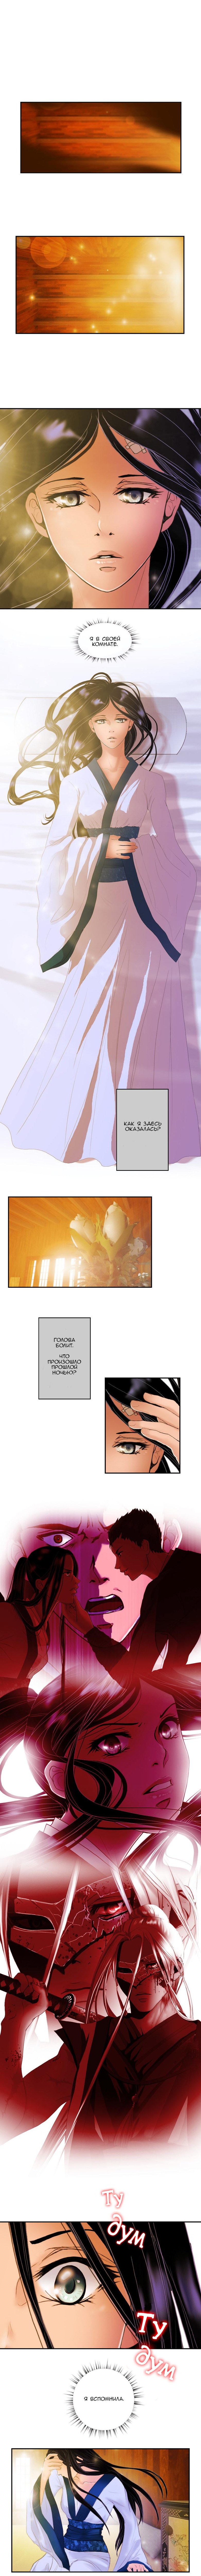 https://r1.ninemanga.com/comics/pic2/50/32242/329513/1500197288485.jpg Page 1